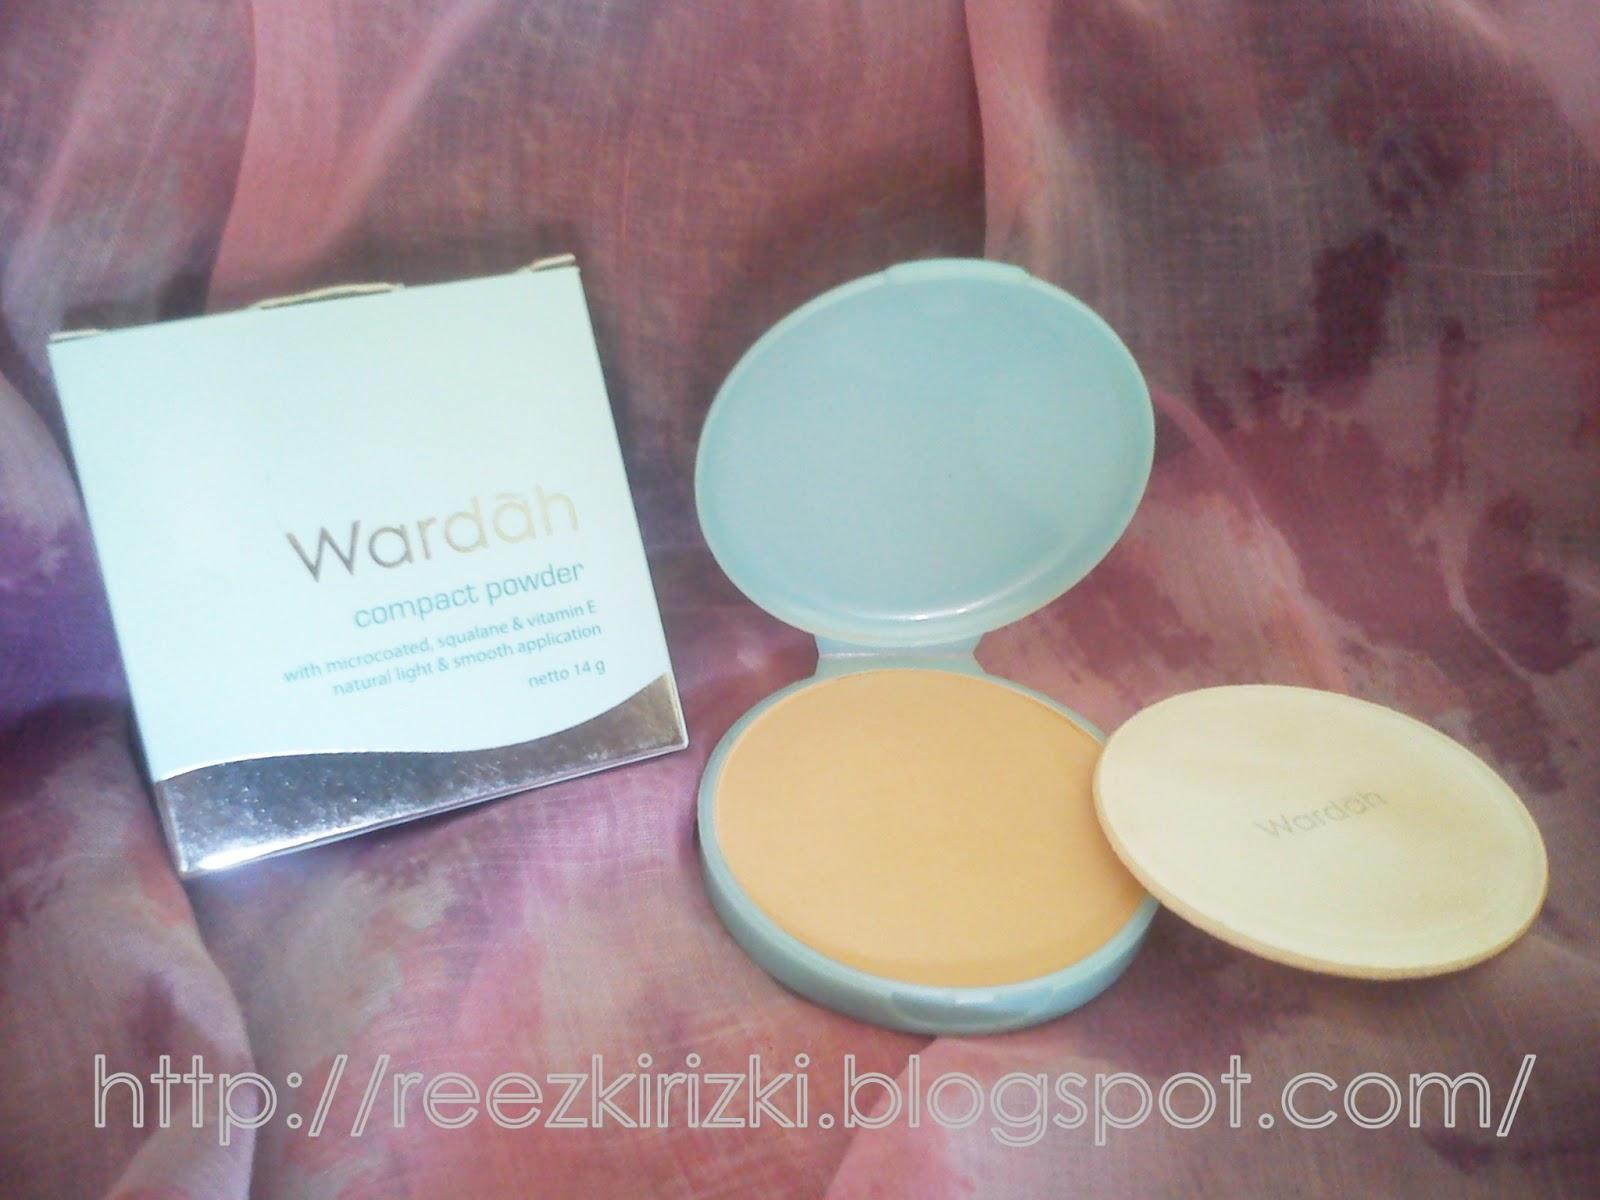 Reezkis Beauty Blog Review Wardah Compact Powder In No